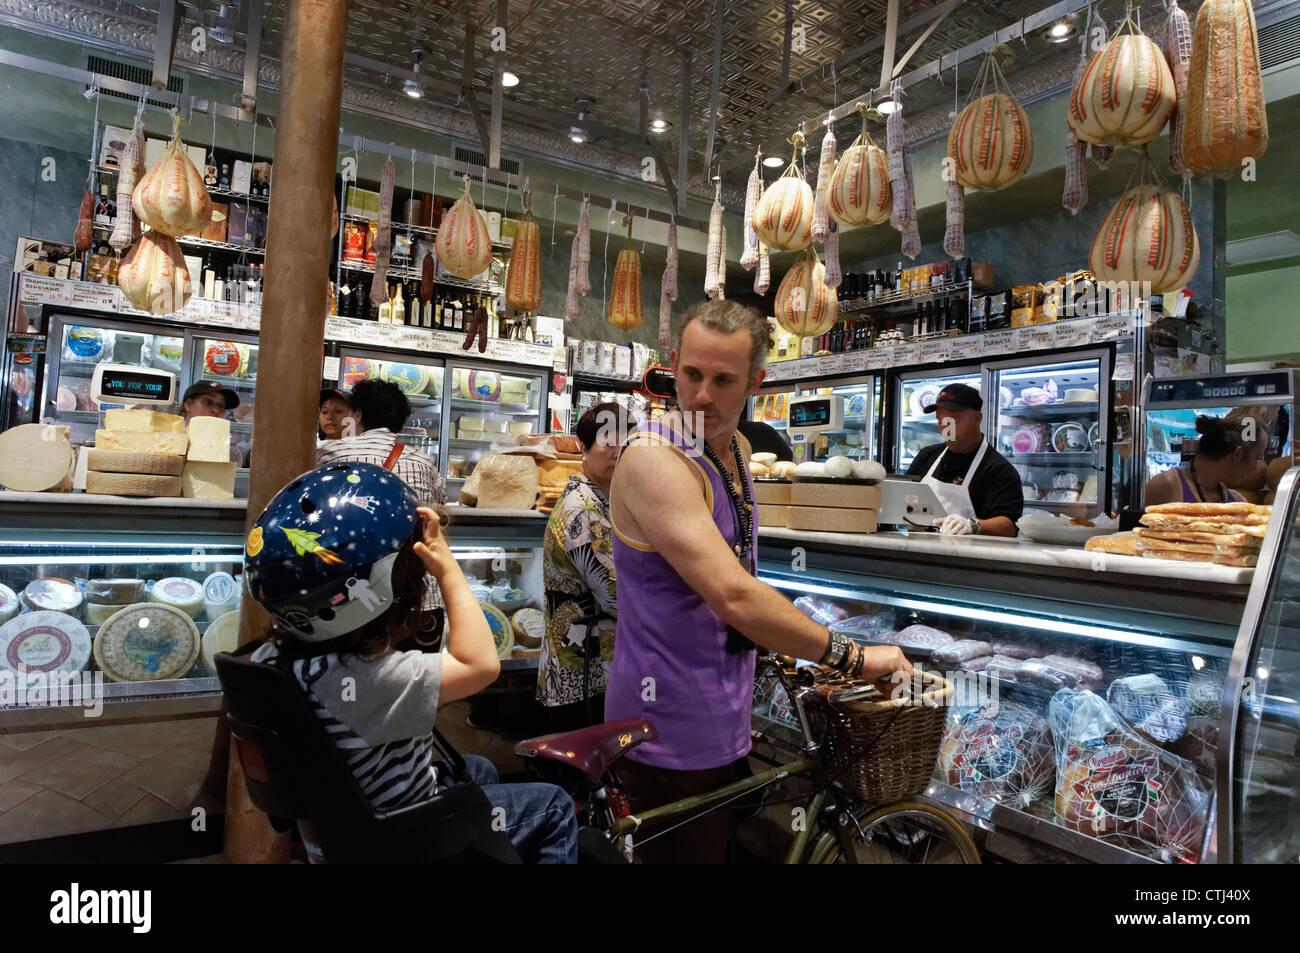 Caseificio DiPalo Fine Foods, Italien Gourmet Shop, Grand Street, Little Italy, New York, STATI UNITI D'AMERICA, Immagini Stock